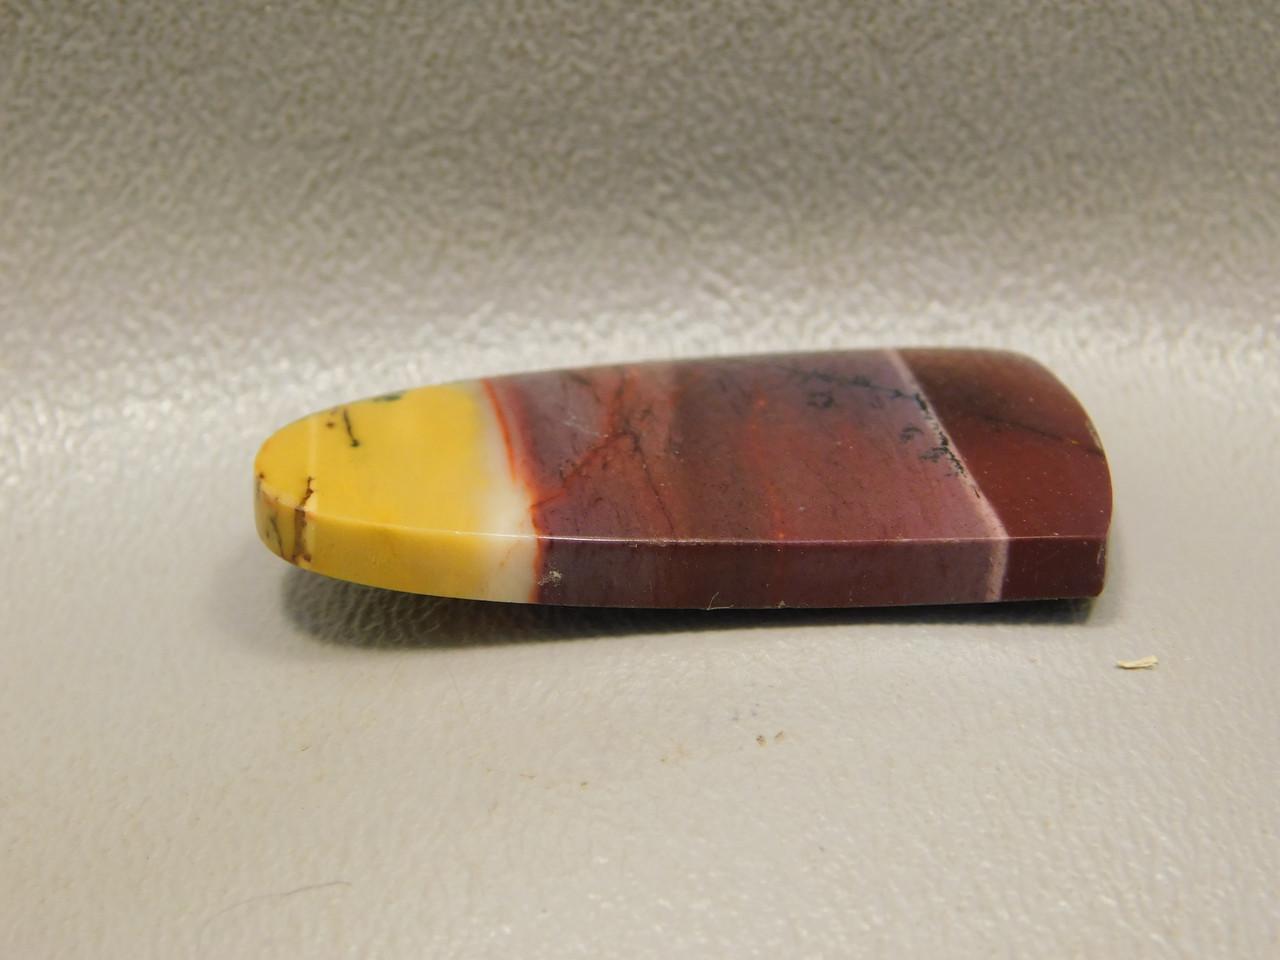 Mookaite Jasper Cabochon Stone Tongue Shaped Gemstone #5